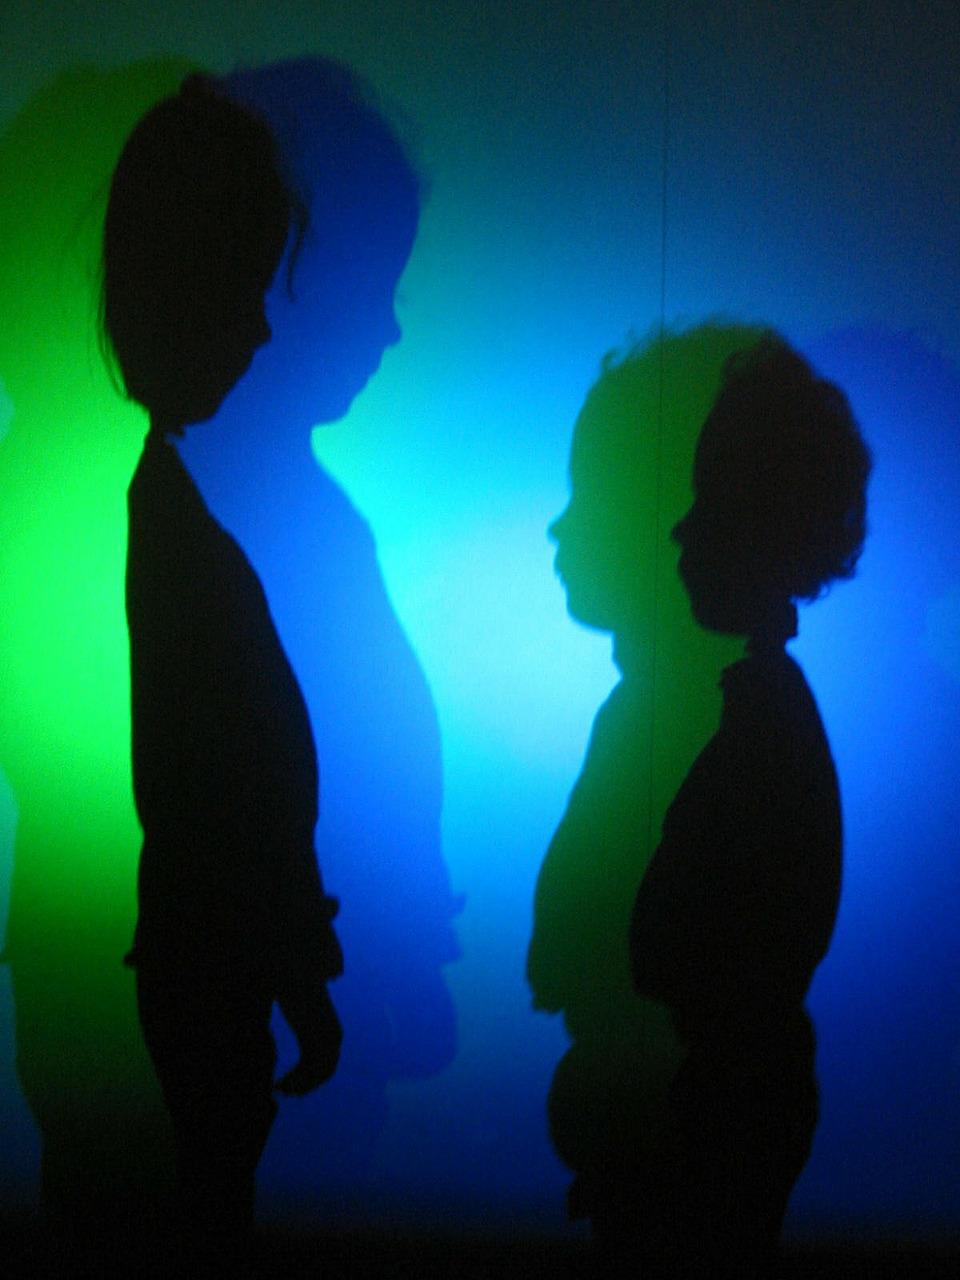 Halloween ideas - Shadow theatre - teatrzyk cieni